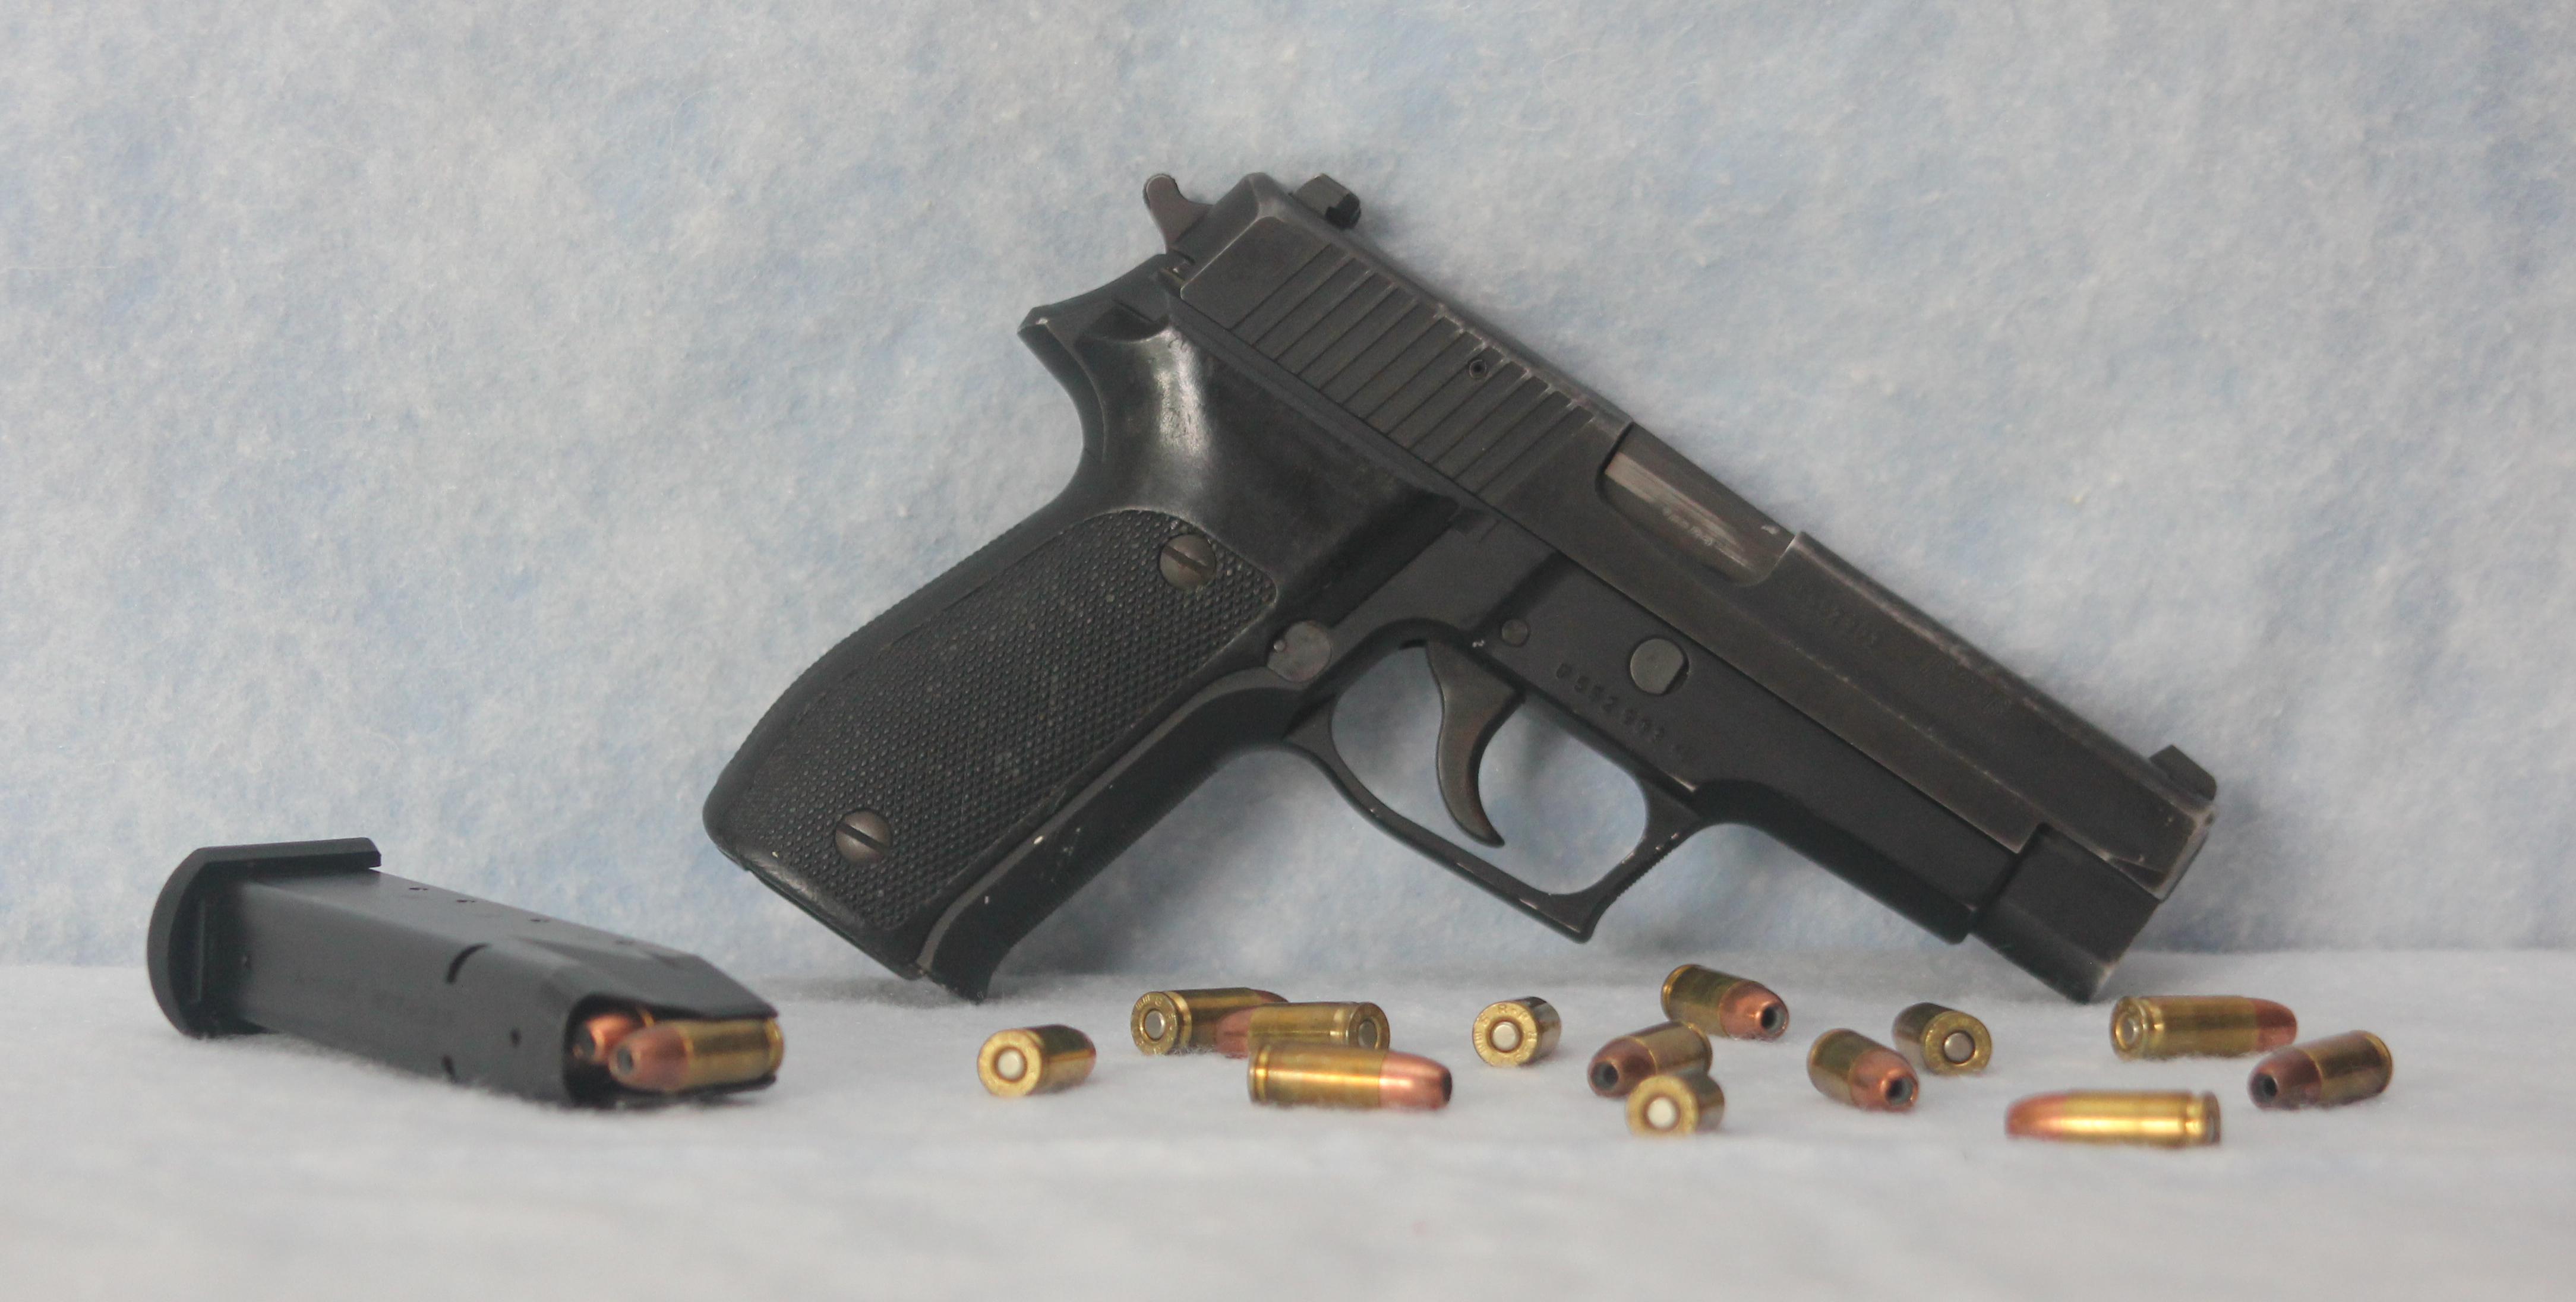 MEC-GAR Aftermarket Magazines for the SIG P226 | Gun Reviews